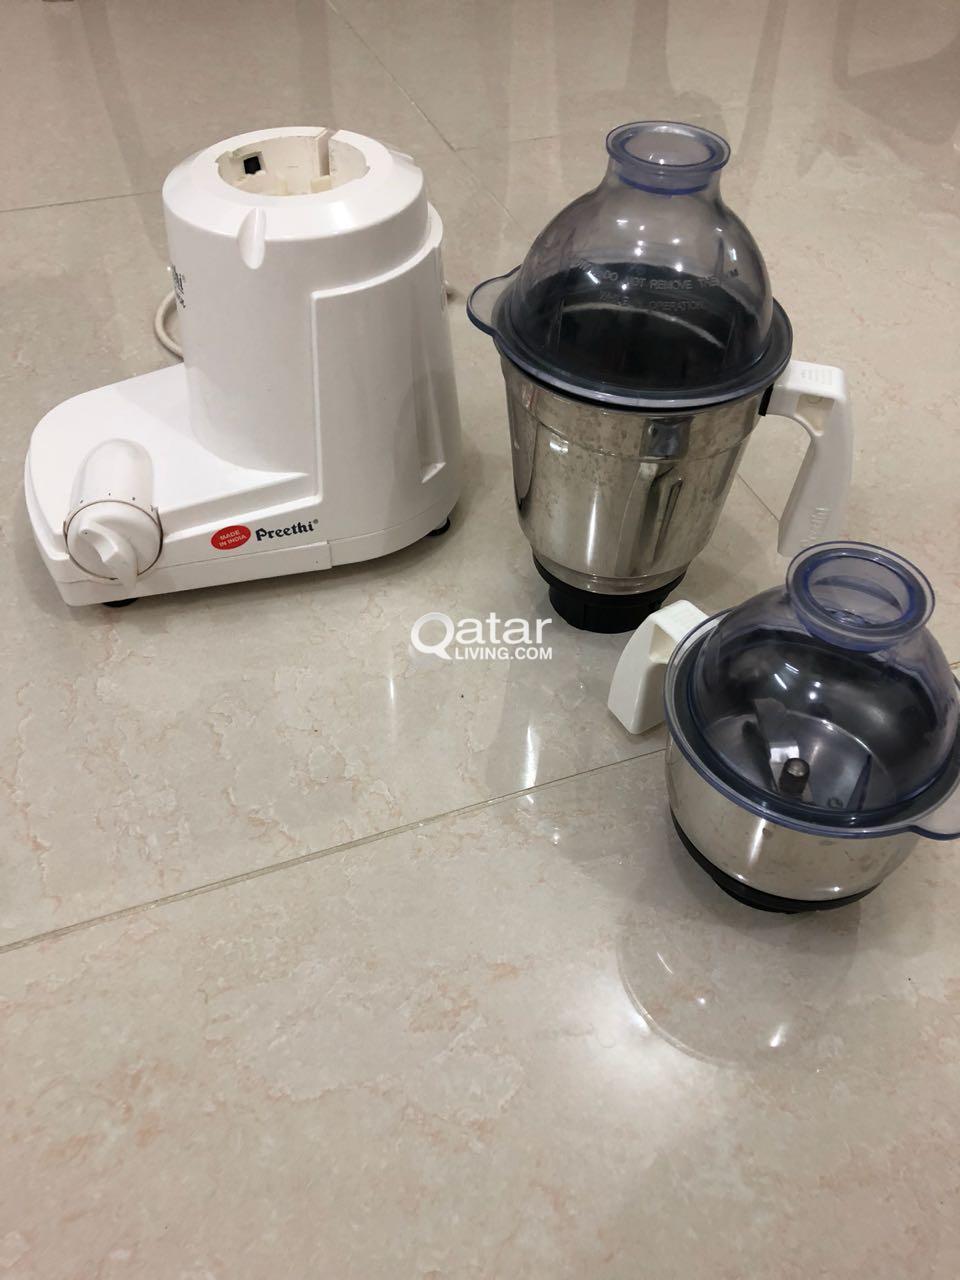 94be80e563d Preethi eco twin mixer grinder